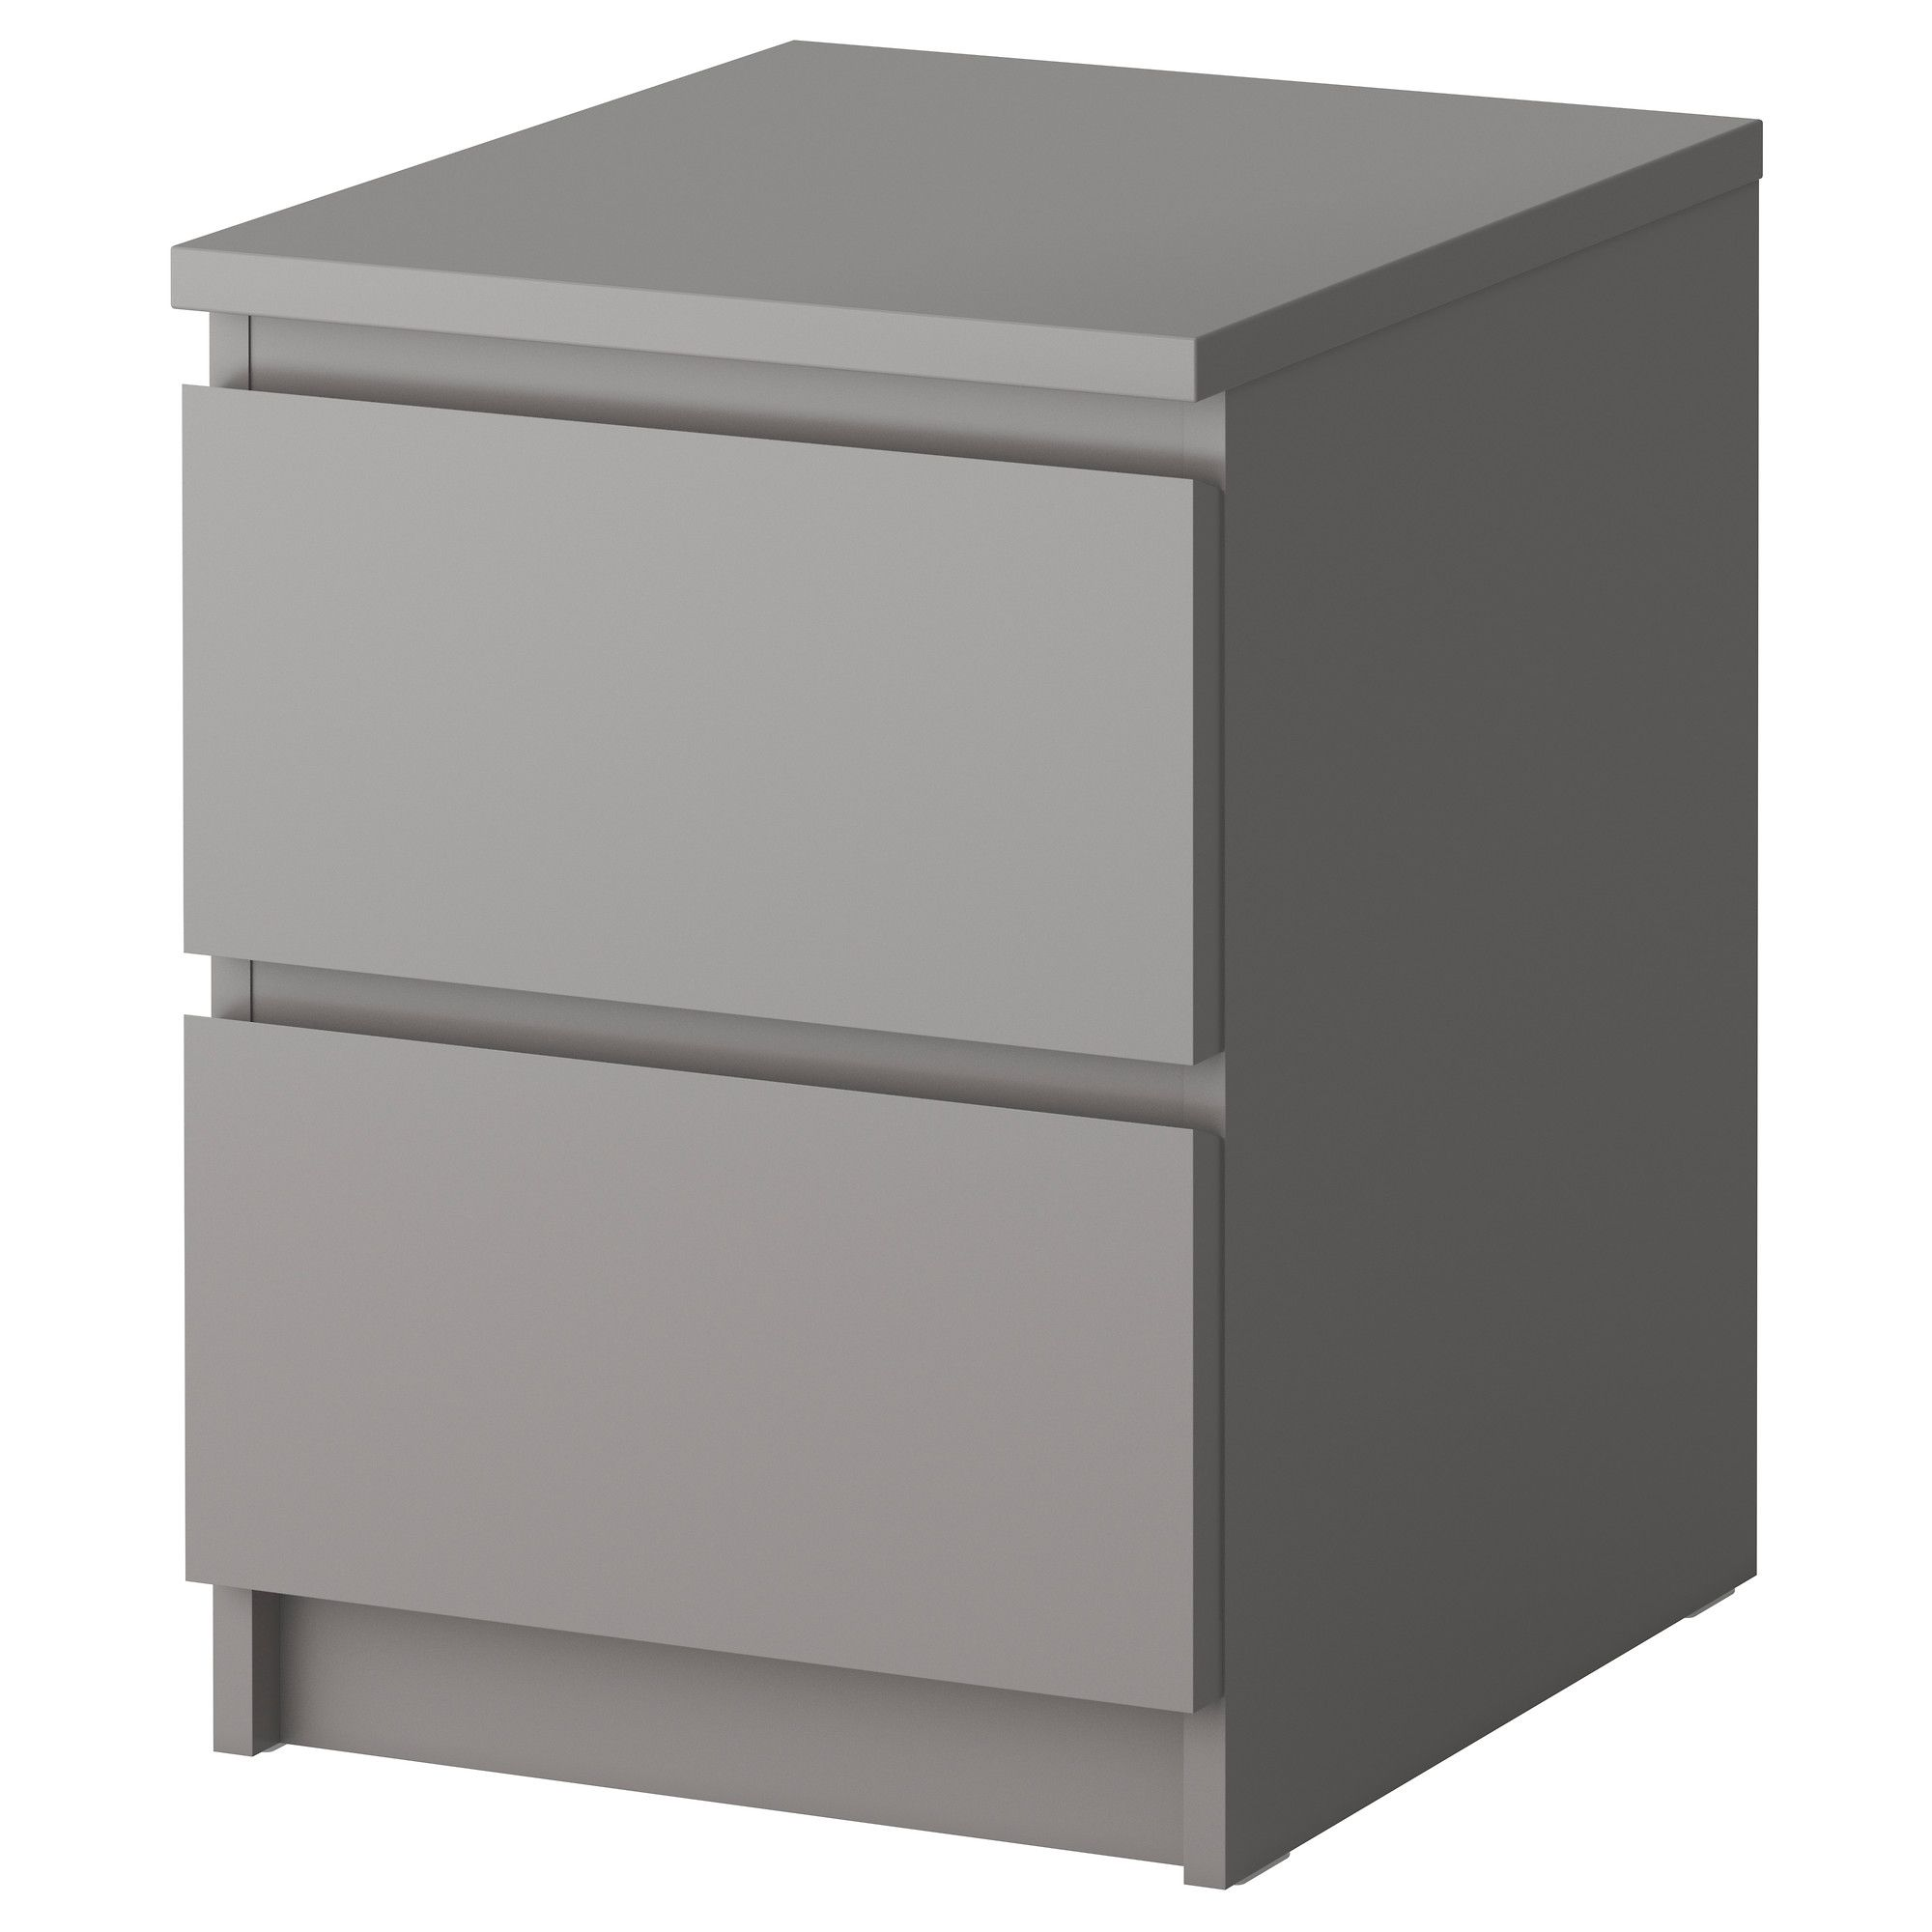 Ikea Us Furniture And Home Furnishings Bedside Table Ikea